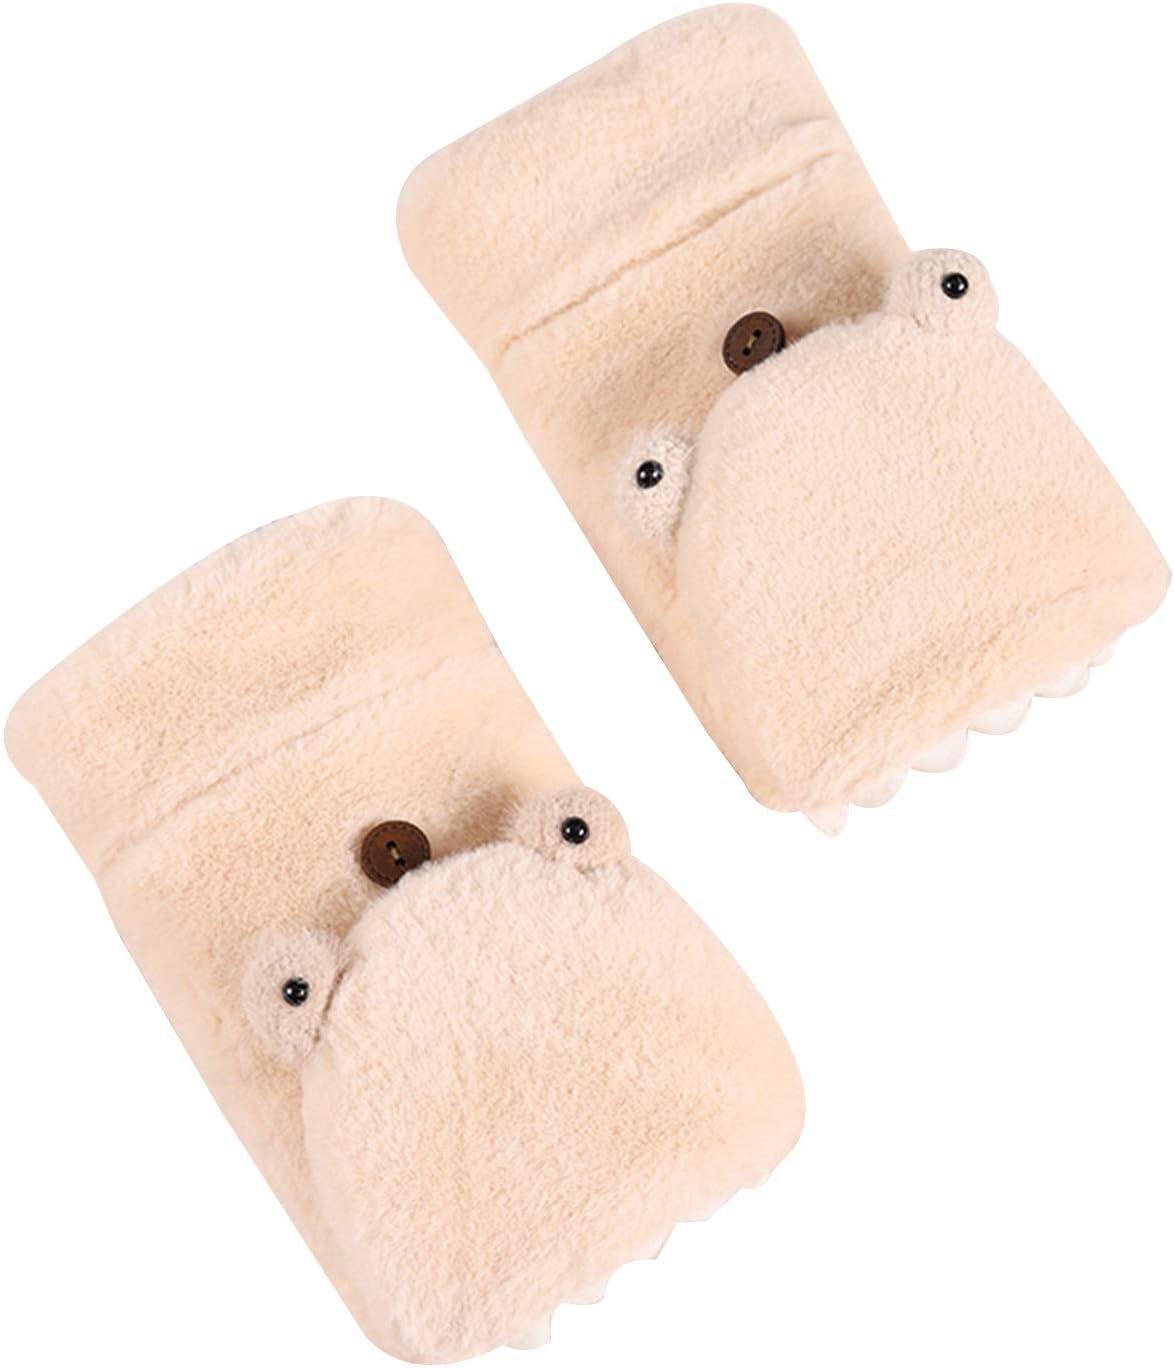 FOLDING Gloves Cute Cartoon Knitted Foldable Fingerless Gloves with Girl Gloves (Color : White)